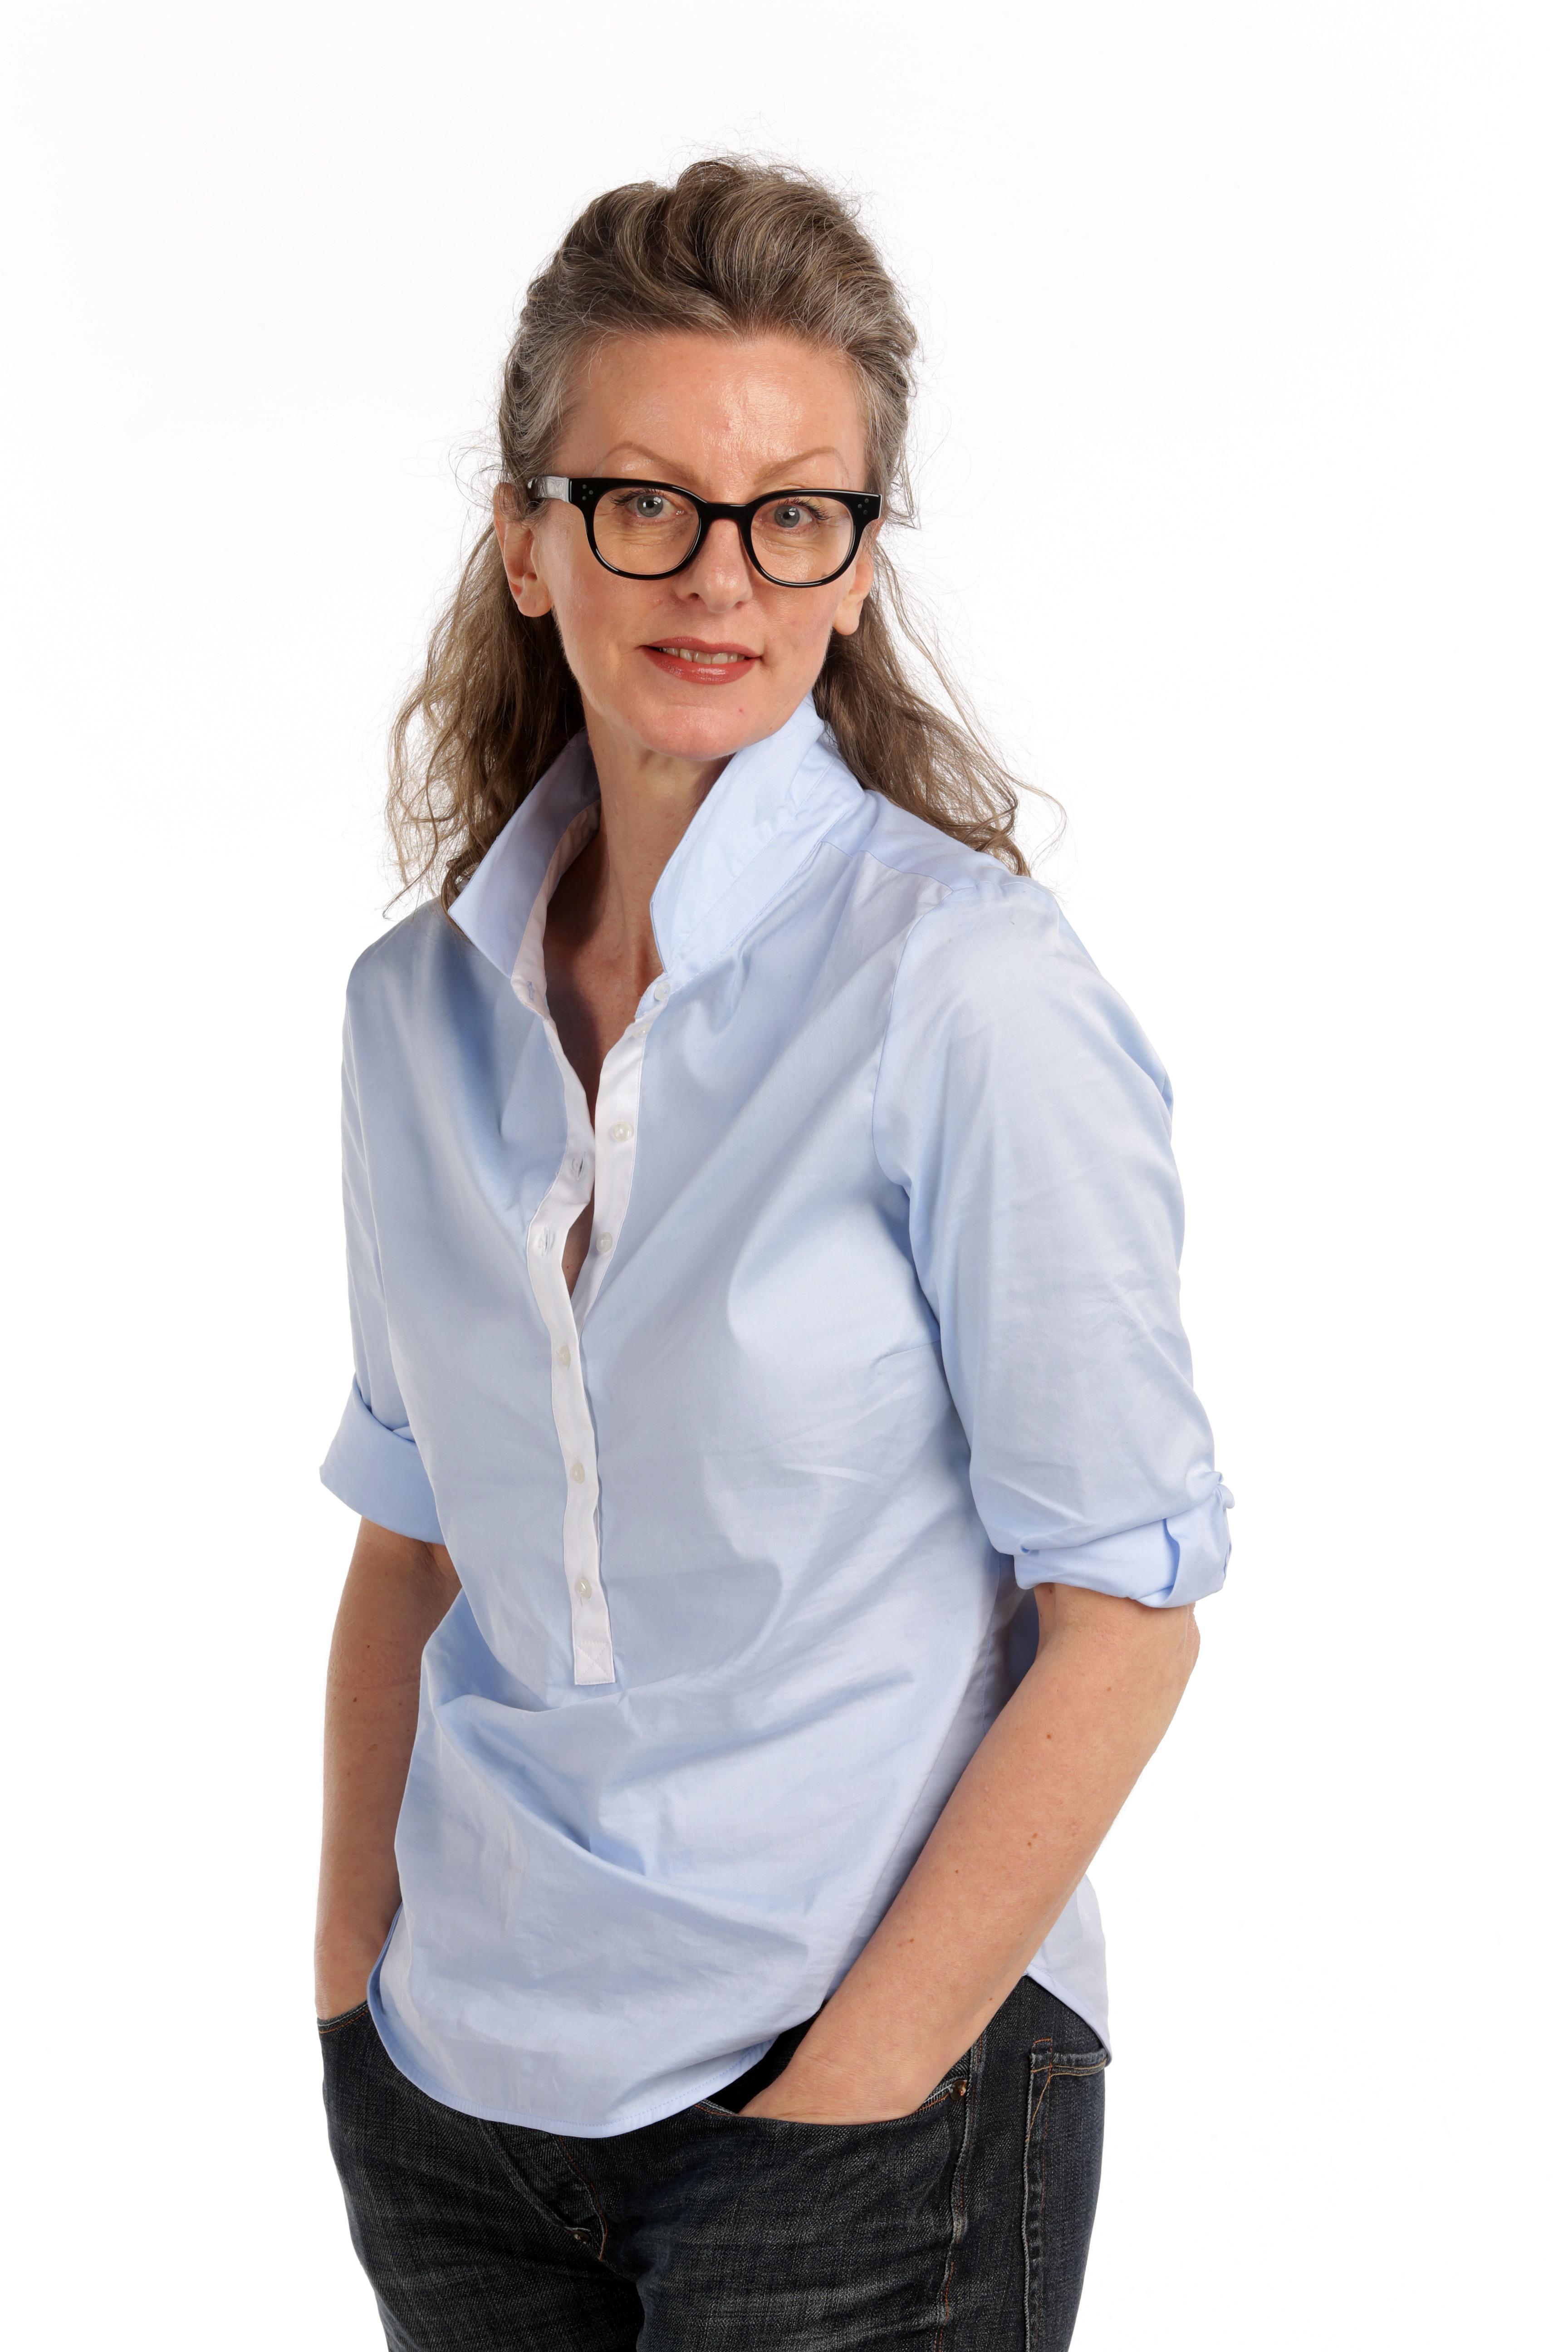 Anne-Maree Gale